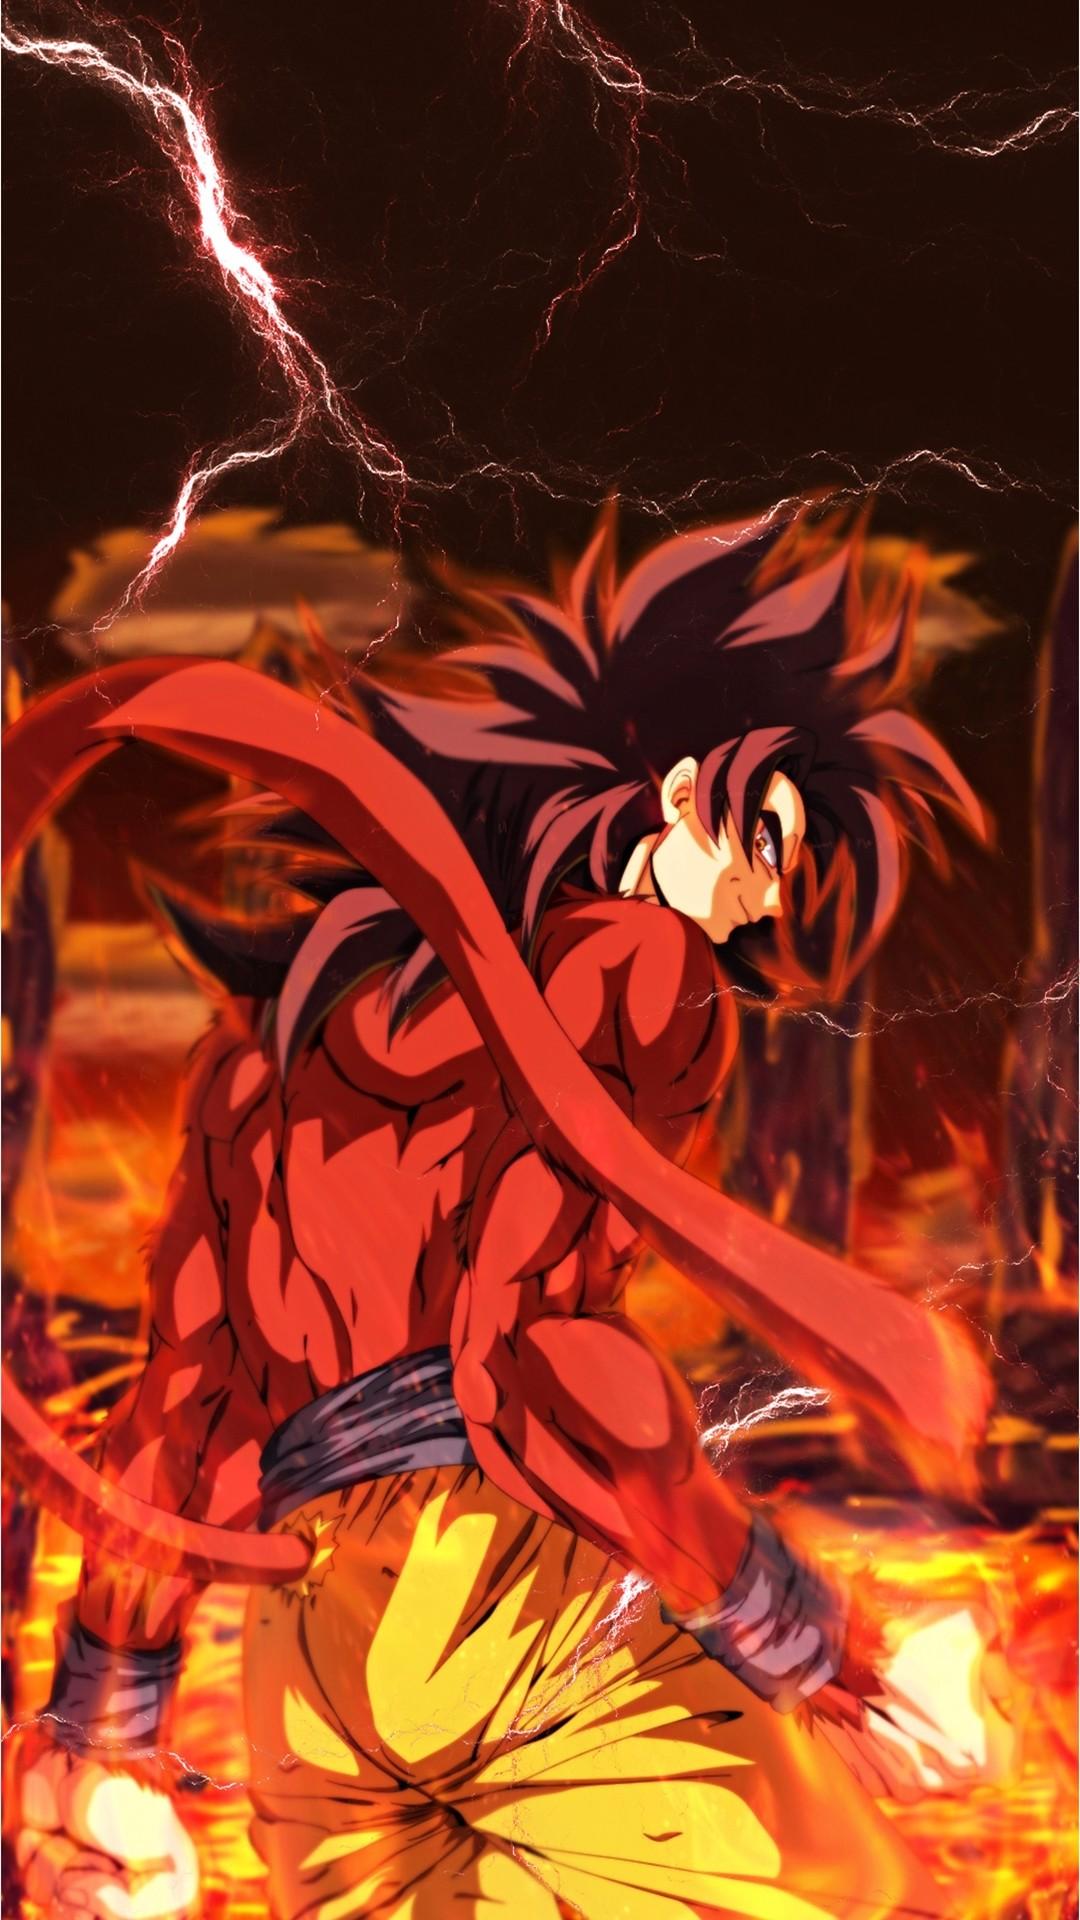 Goku ssj4 wallpaper wallpapertag - Ssj4 vegeta wallpaper ...